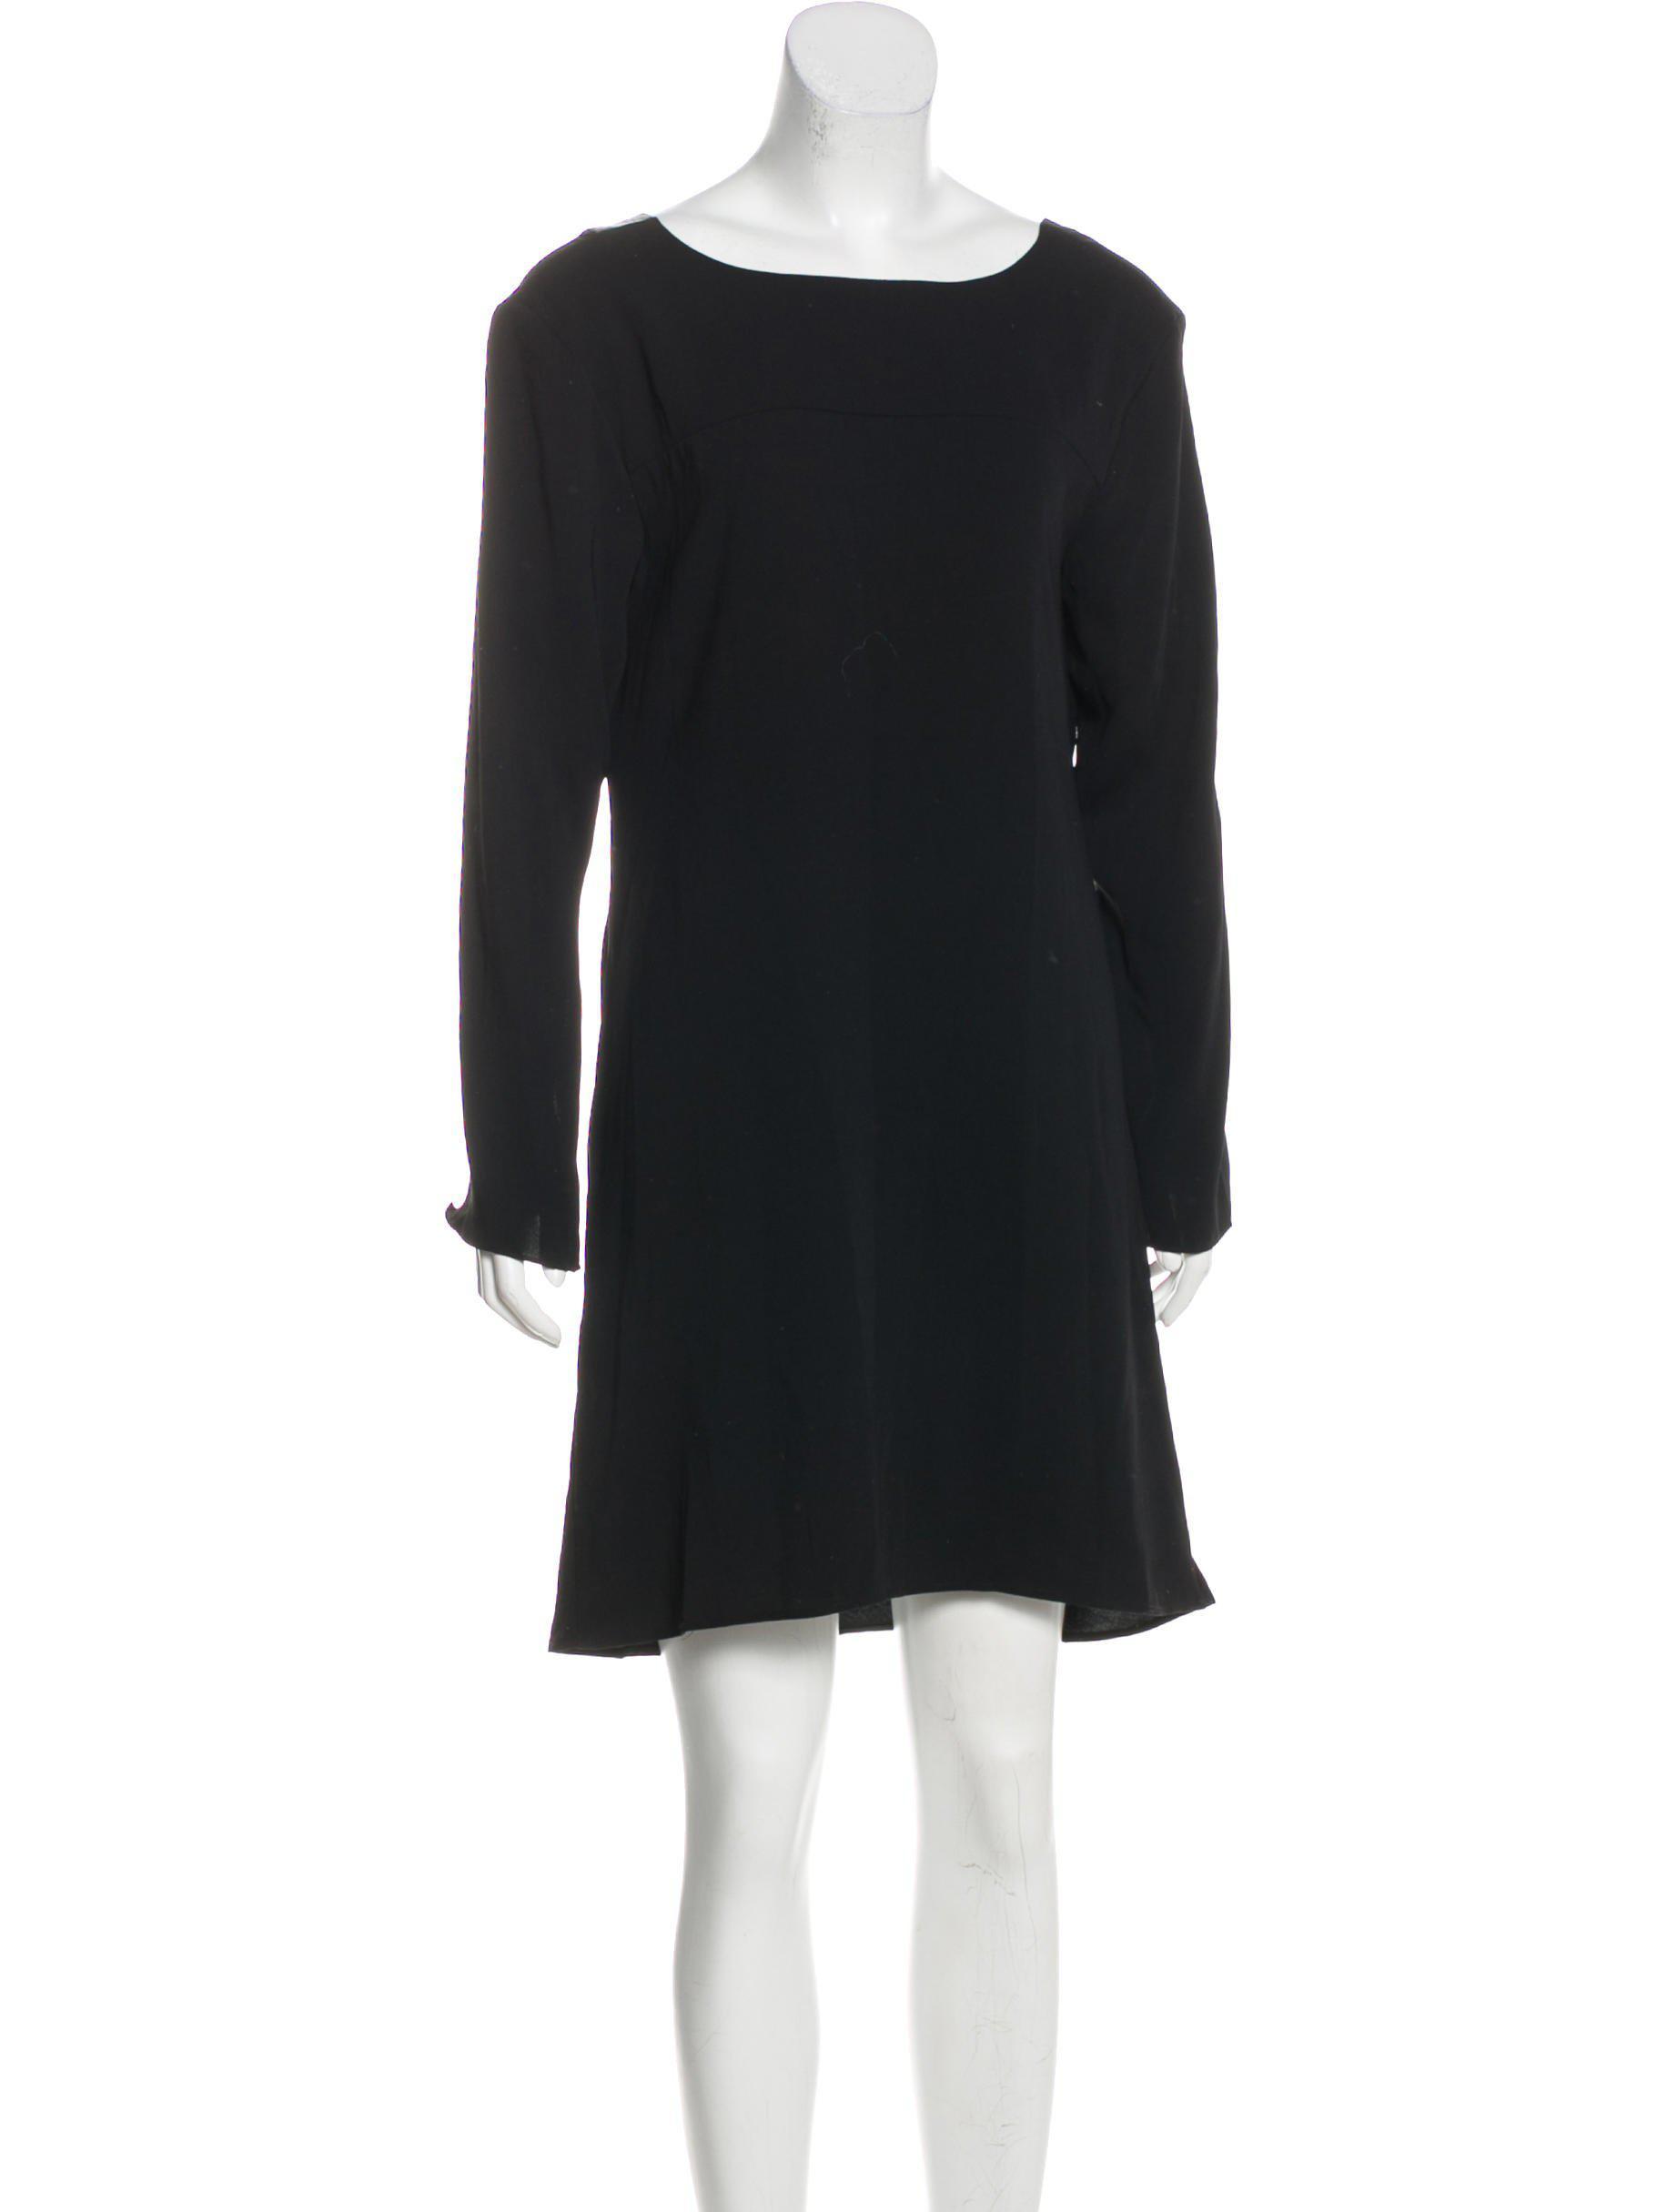 7aa8b259ba2b Lyst - Halston Heritage Knee-length Long Sleeve Dress in Black